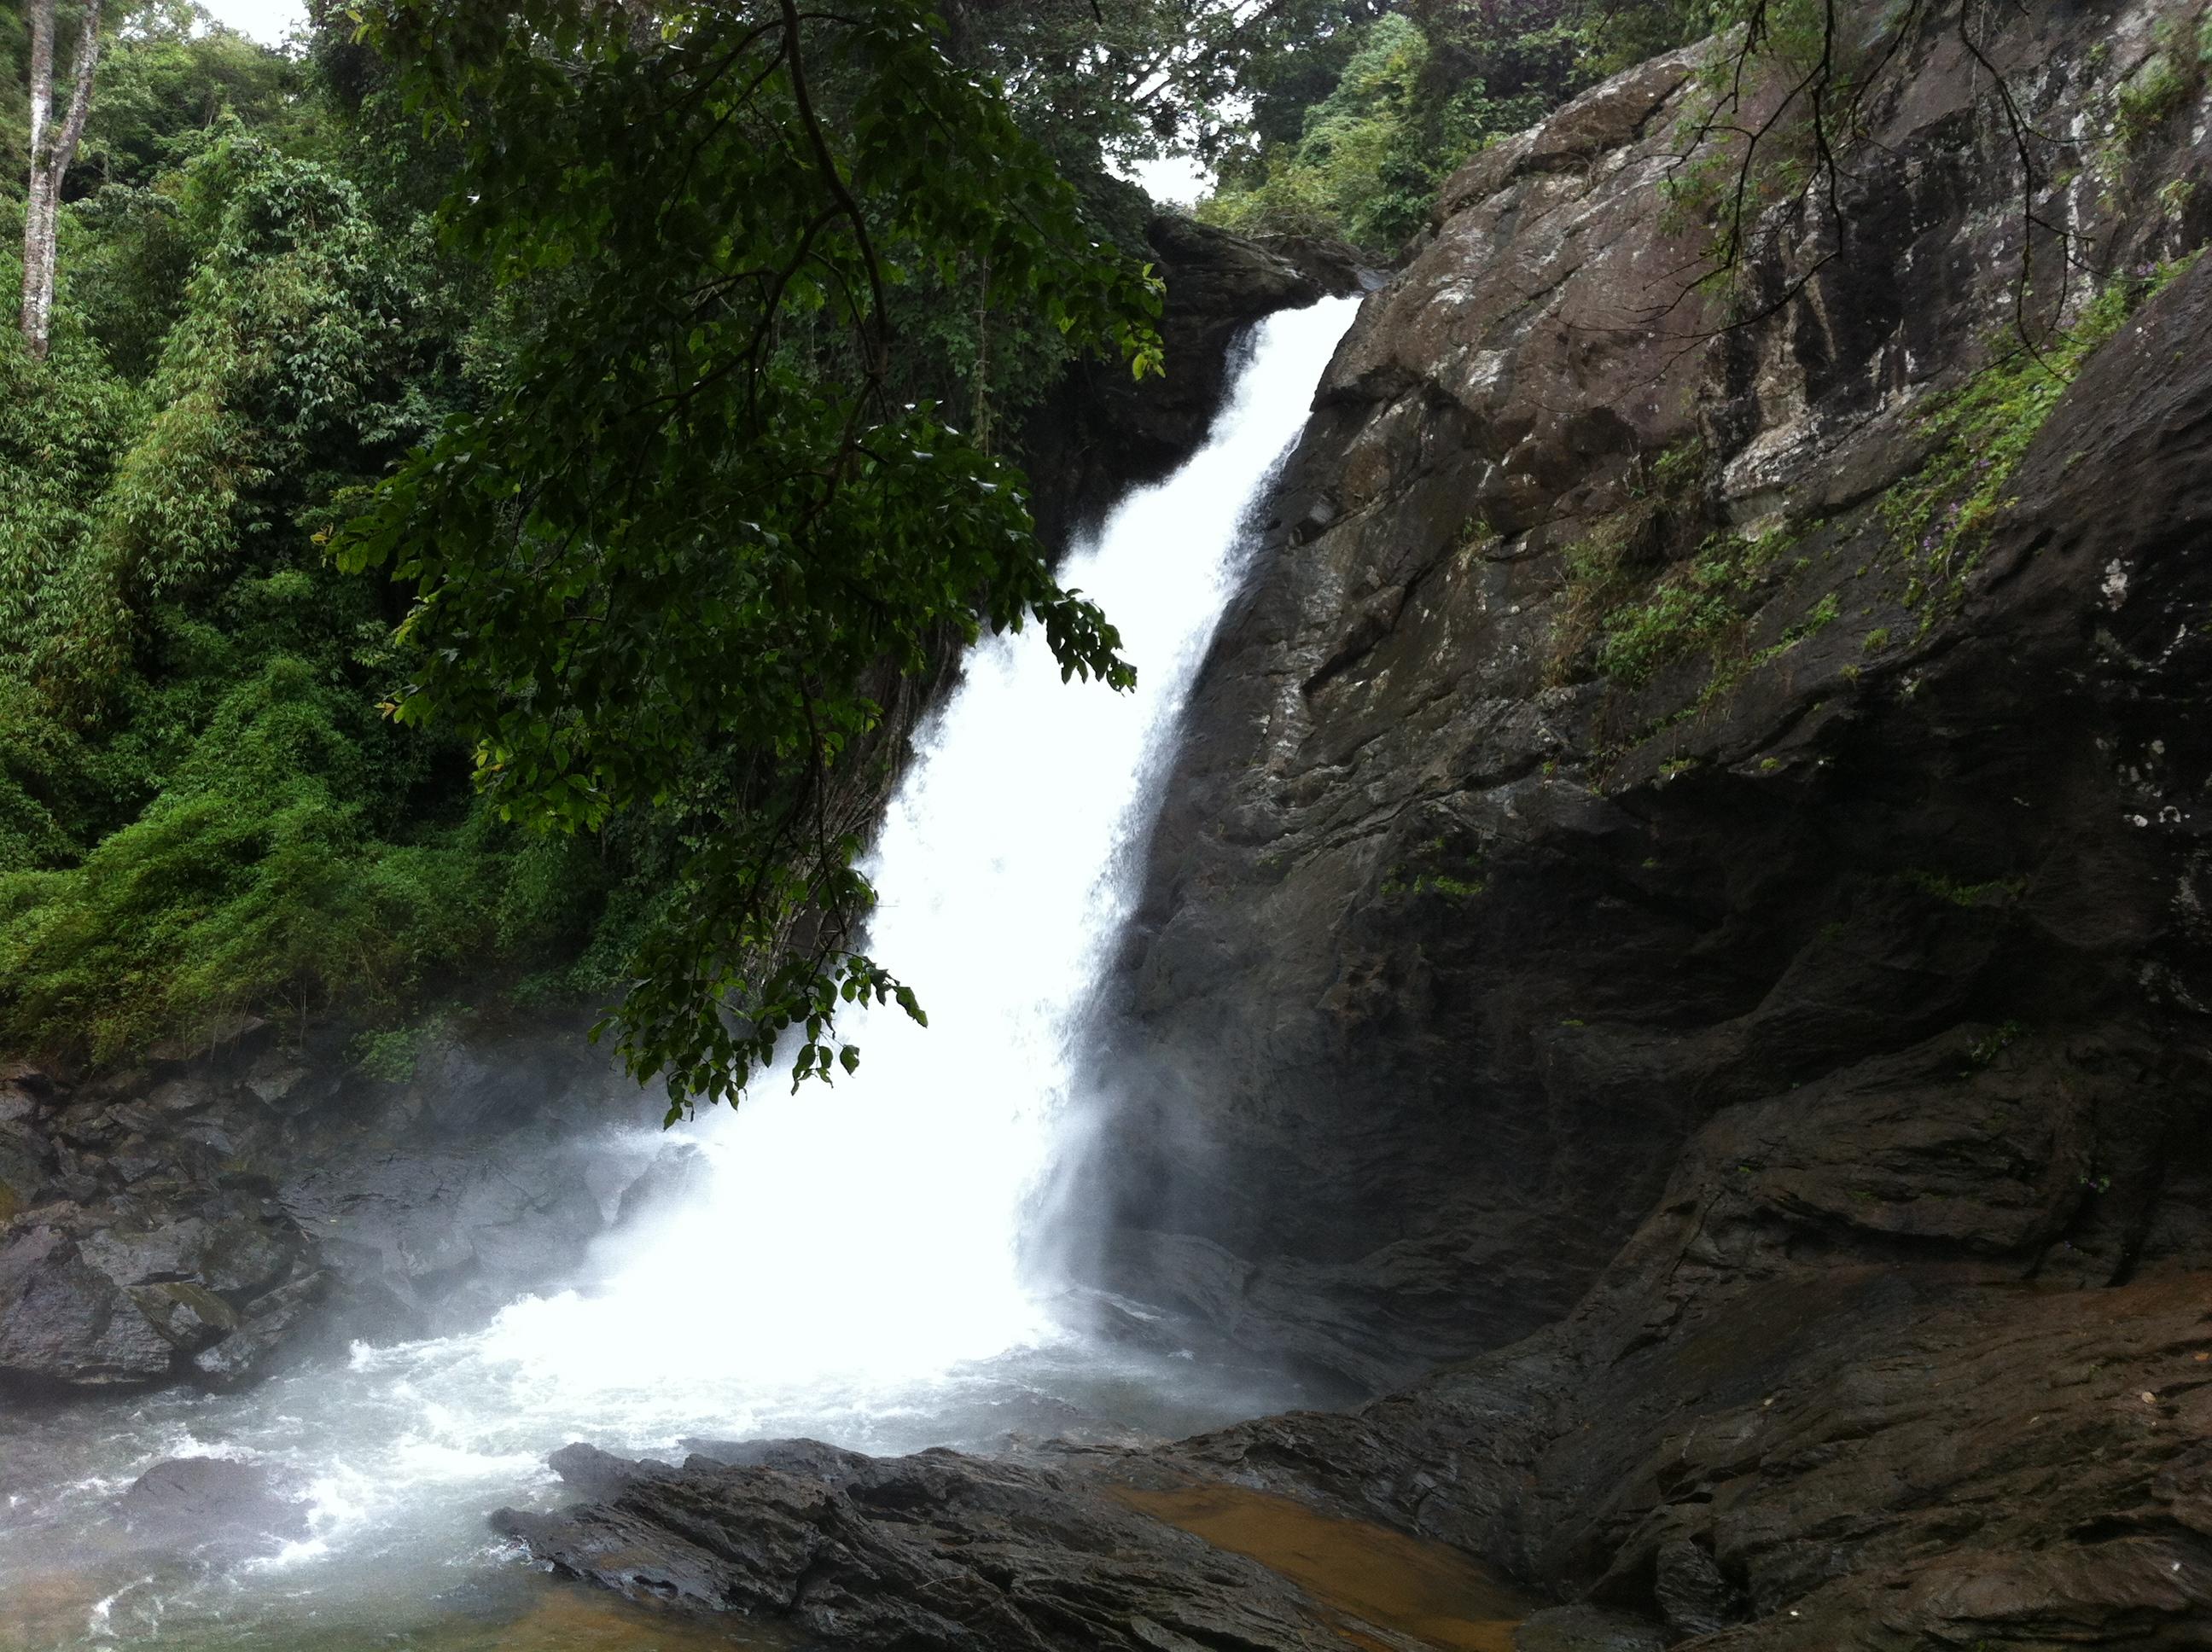 Soochiparai falls alias Sentinel Rock Waterfalls